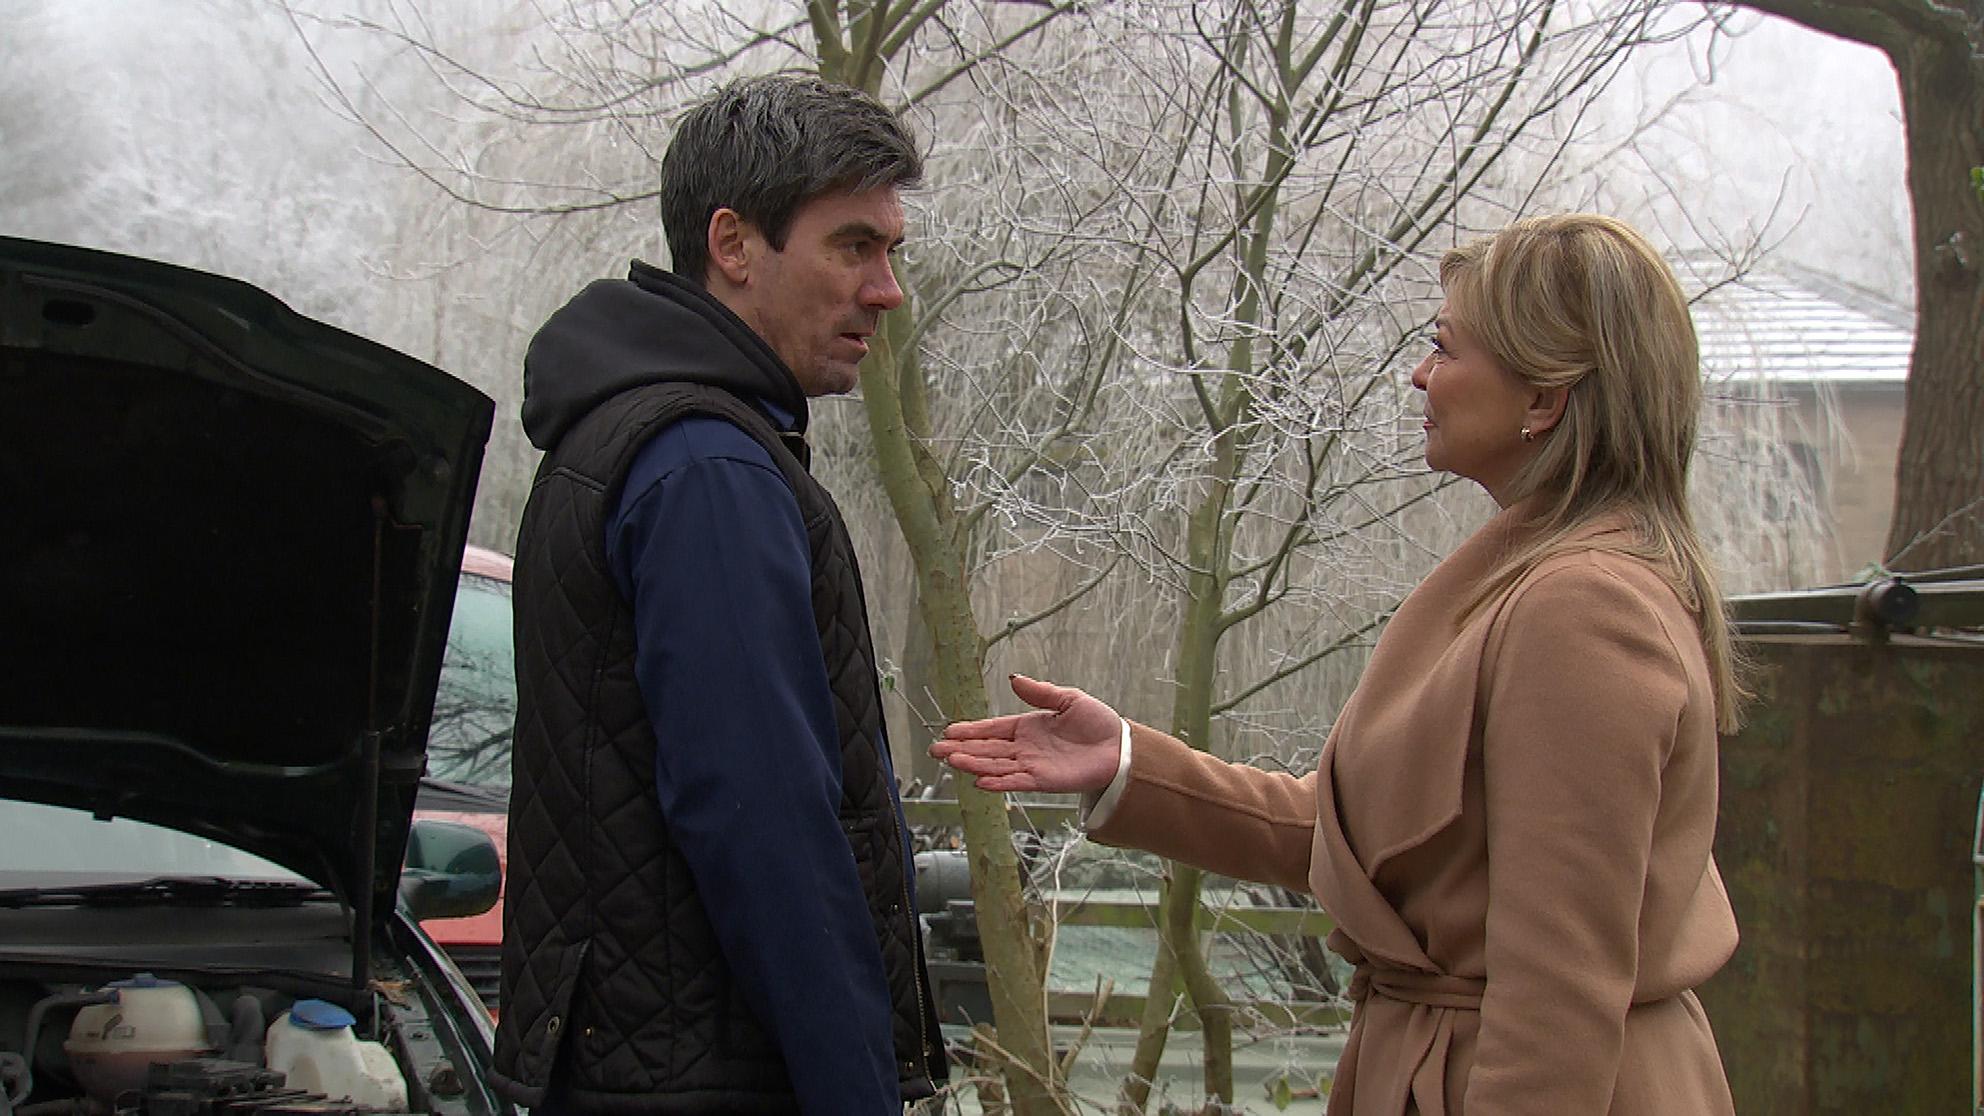 Kim threatens Cain in Emmerdale